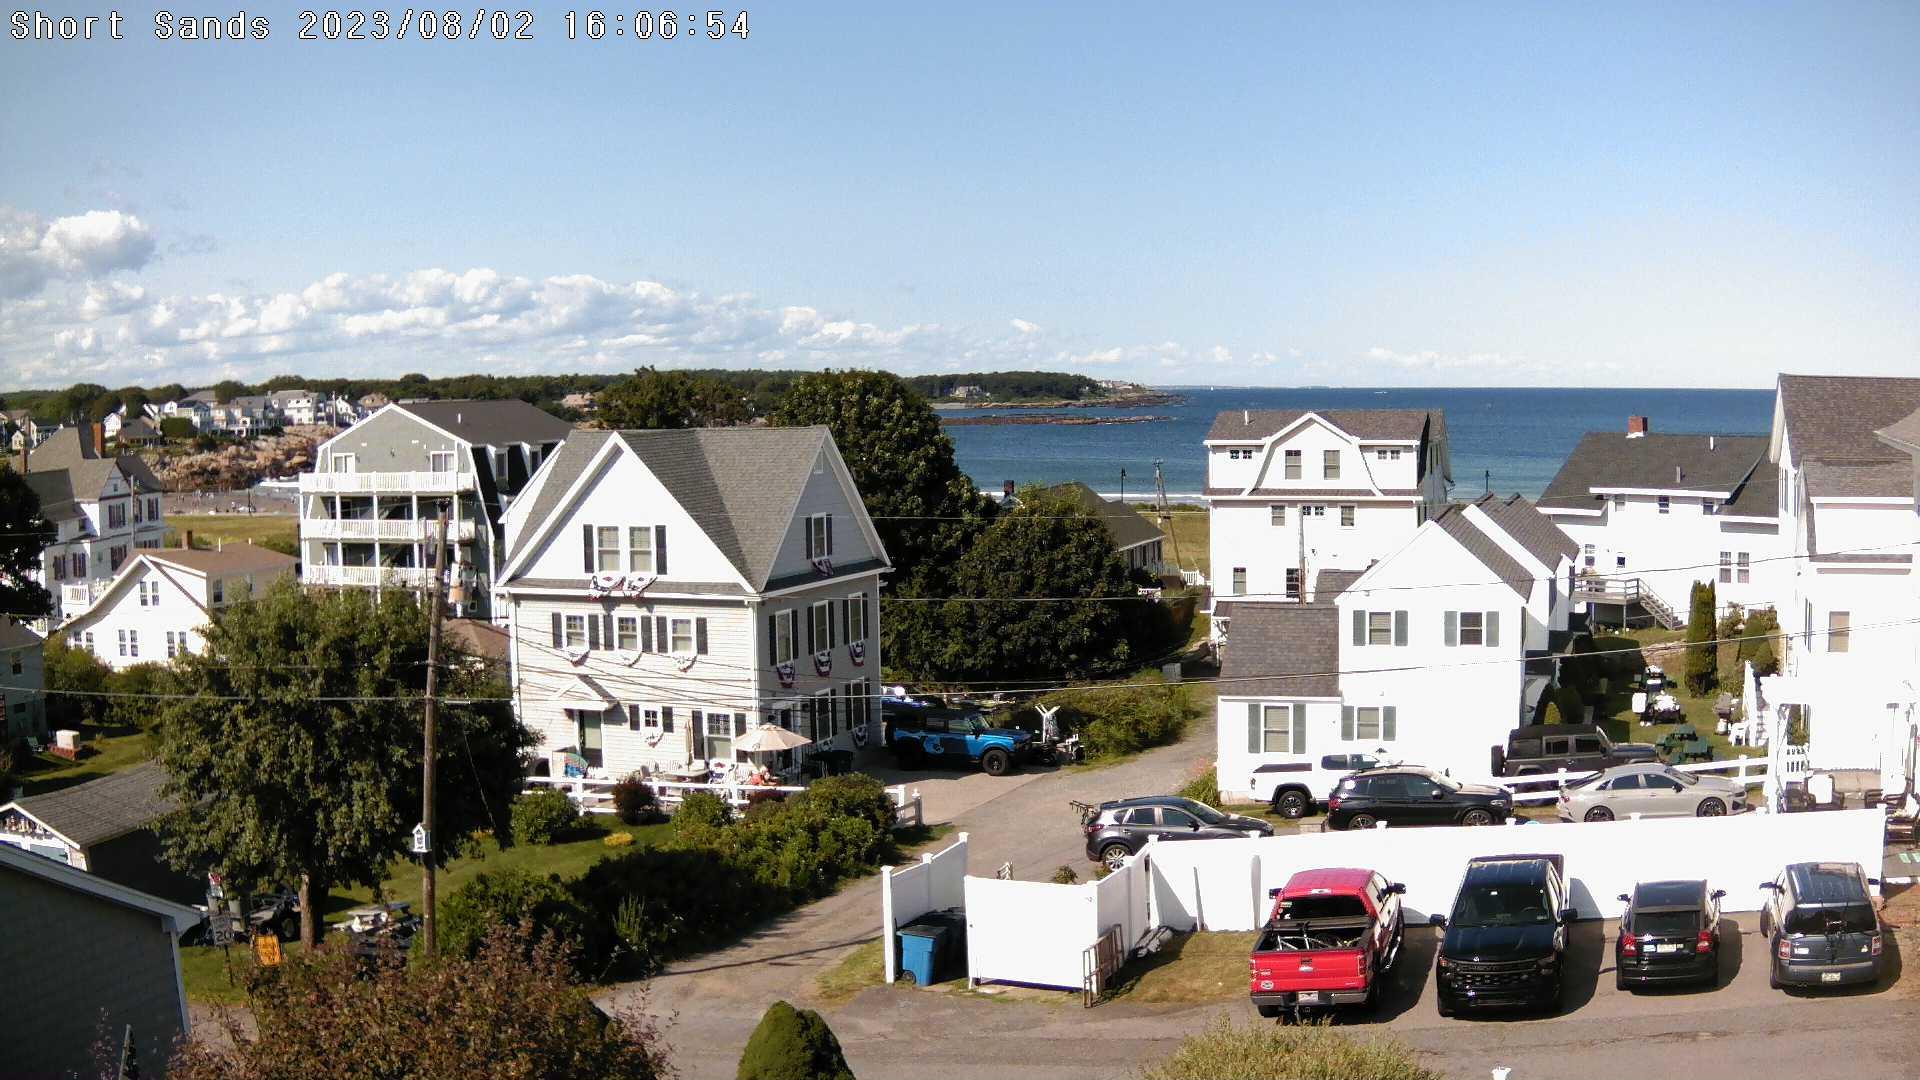 York Beach, Maine Ven. 16:07